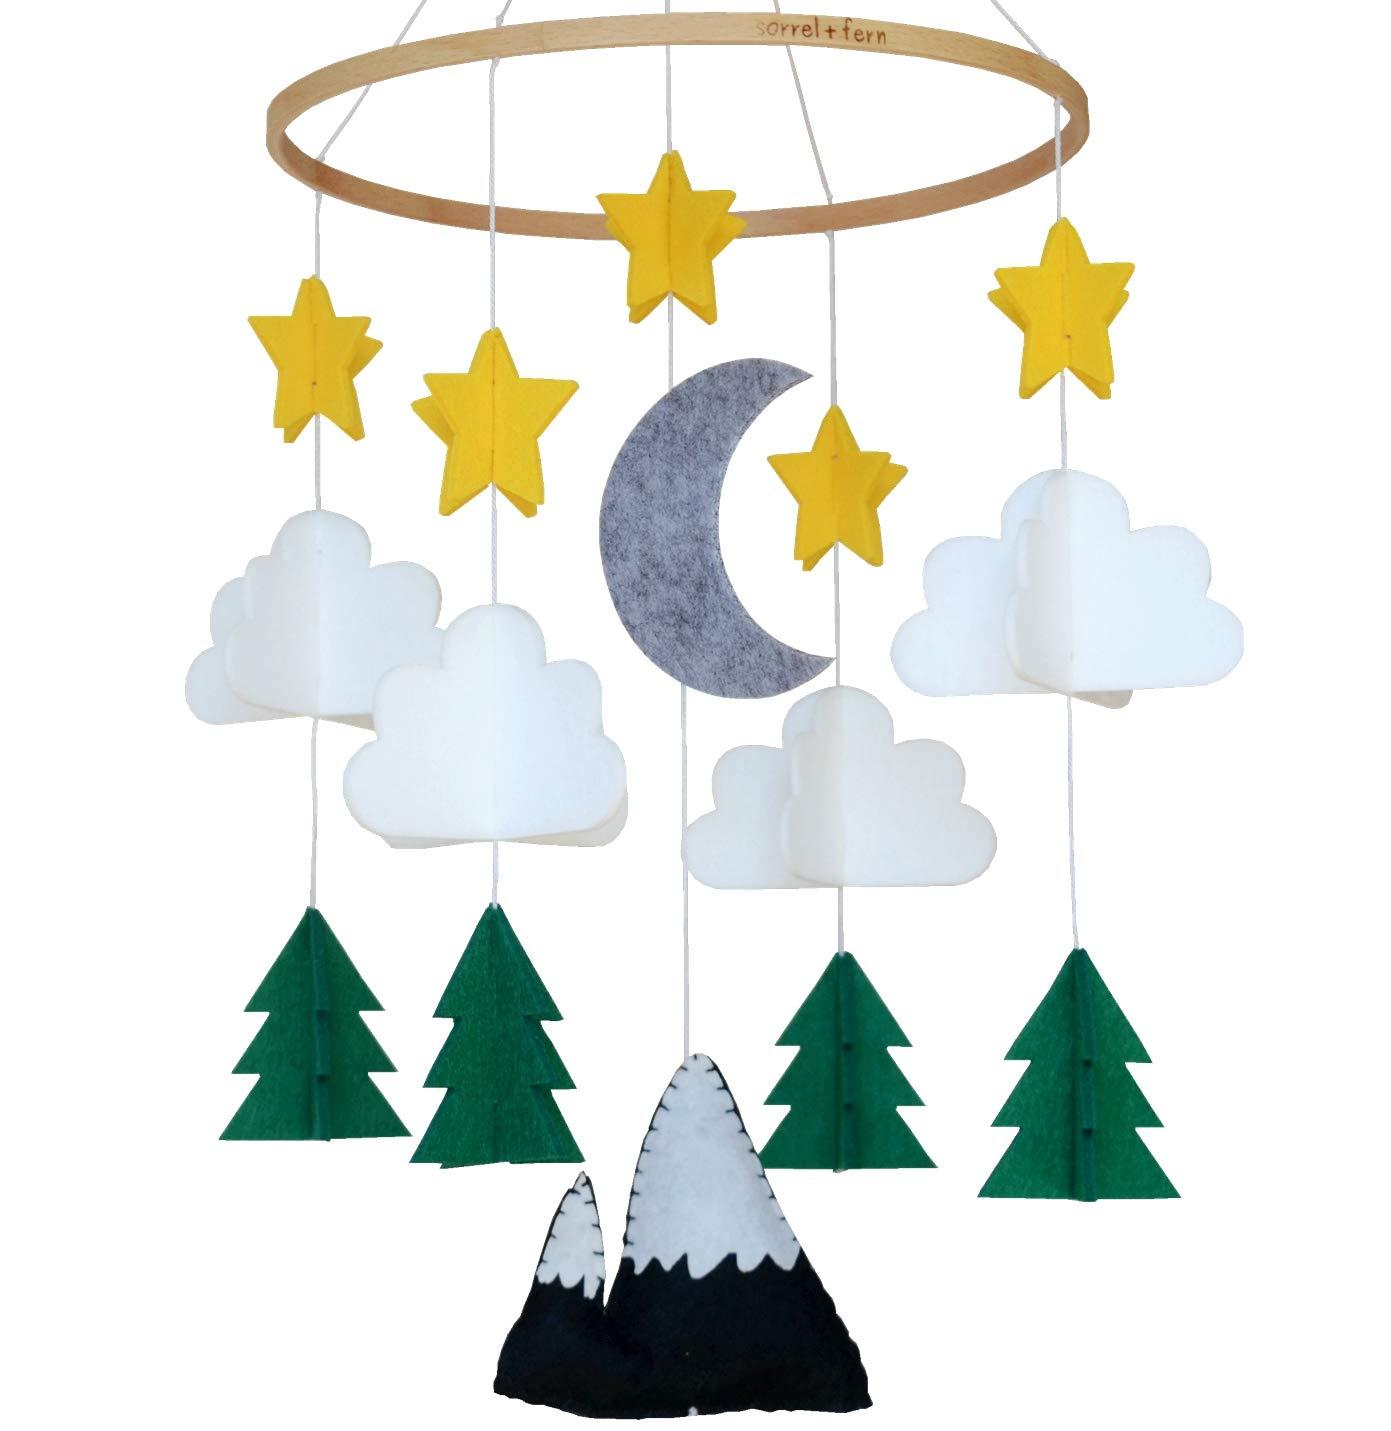 Baby Crib Mobile Denver Mall by Sorrel Woodland Starry Tulsa Mall Nursery Night Fern-